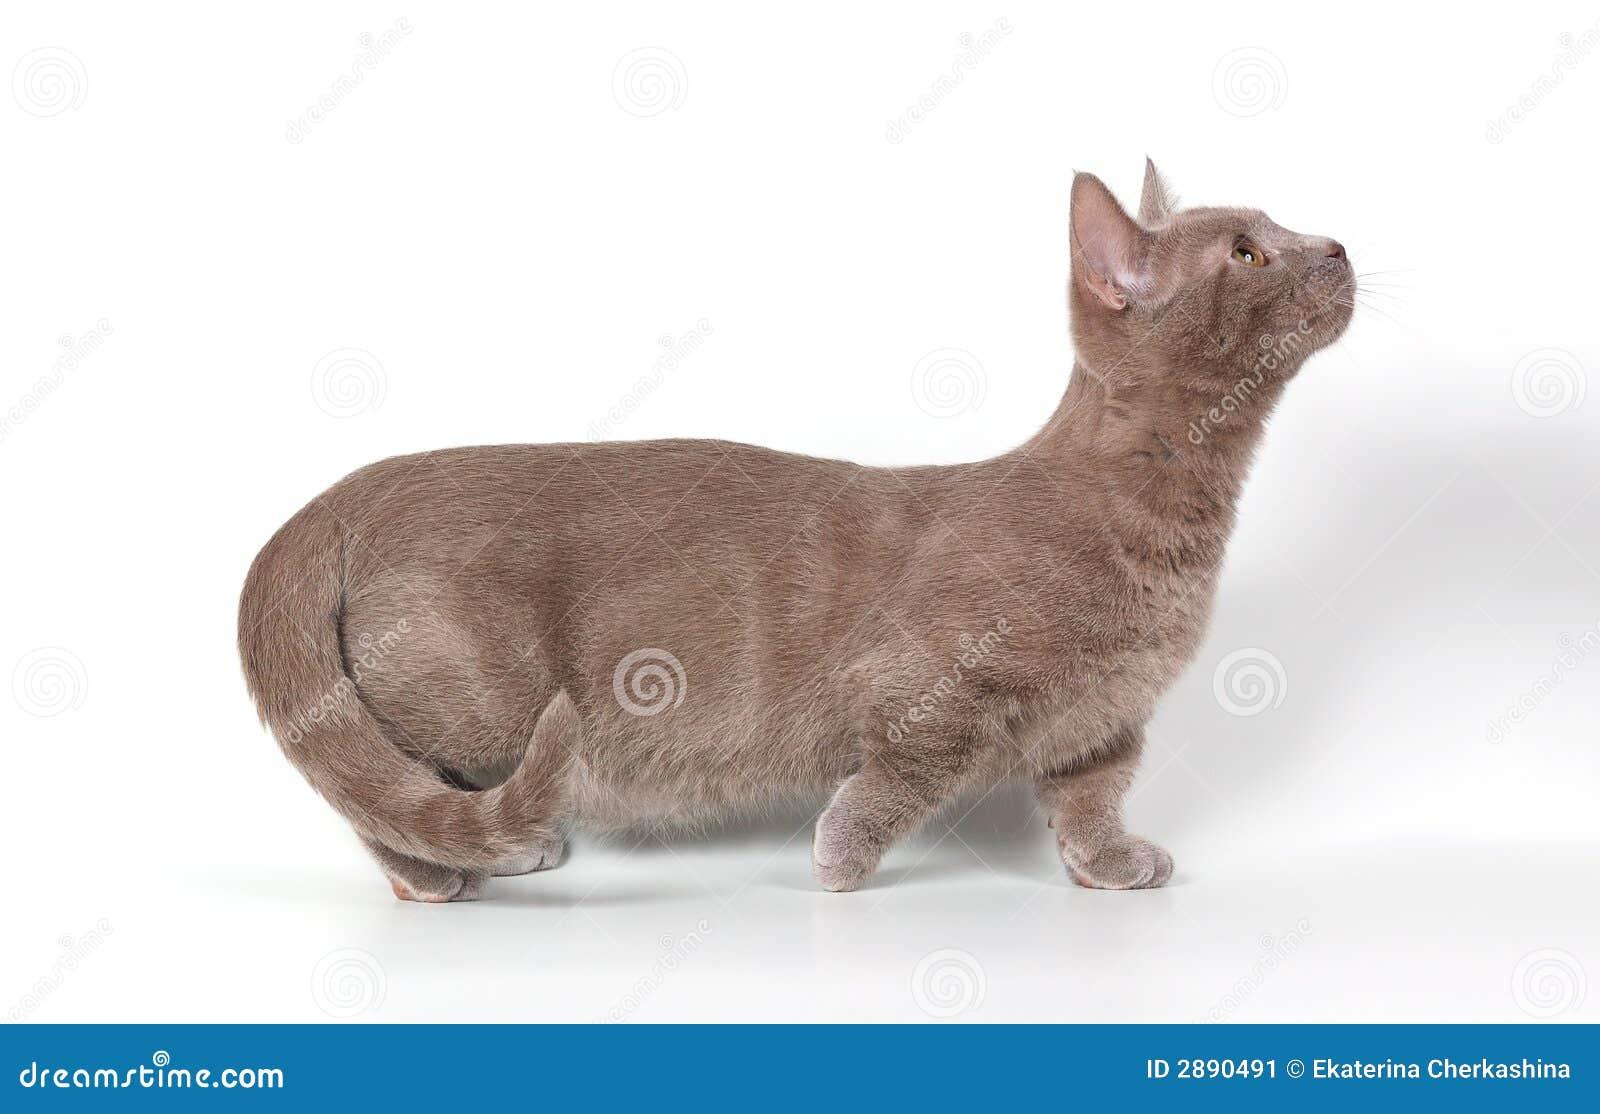 Le chaton munchkin image stock image du cuddly favori 2890491 - Chat munchkin prix ...